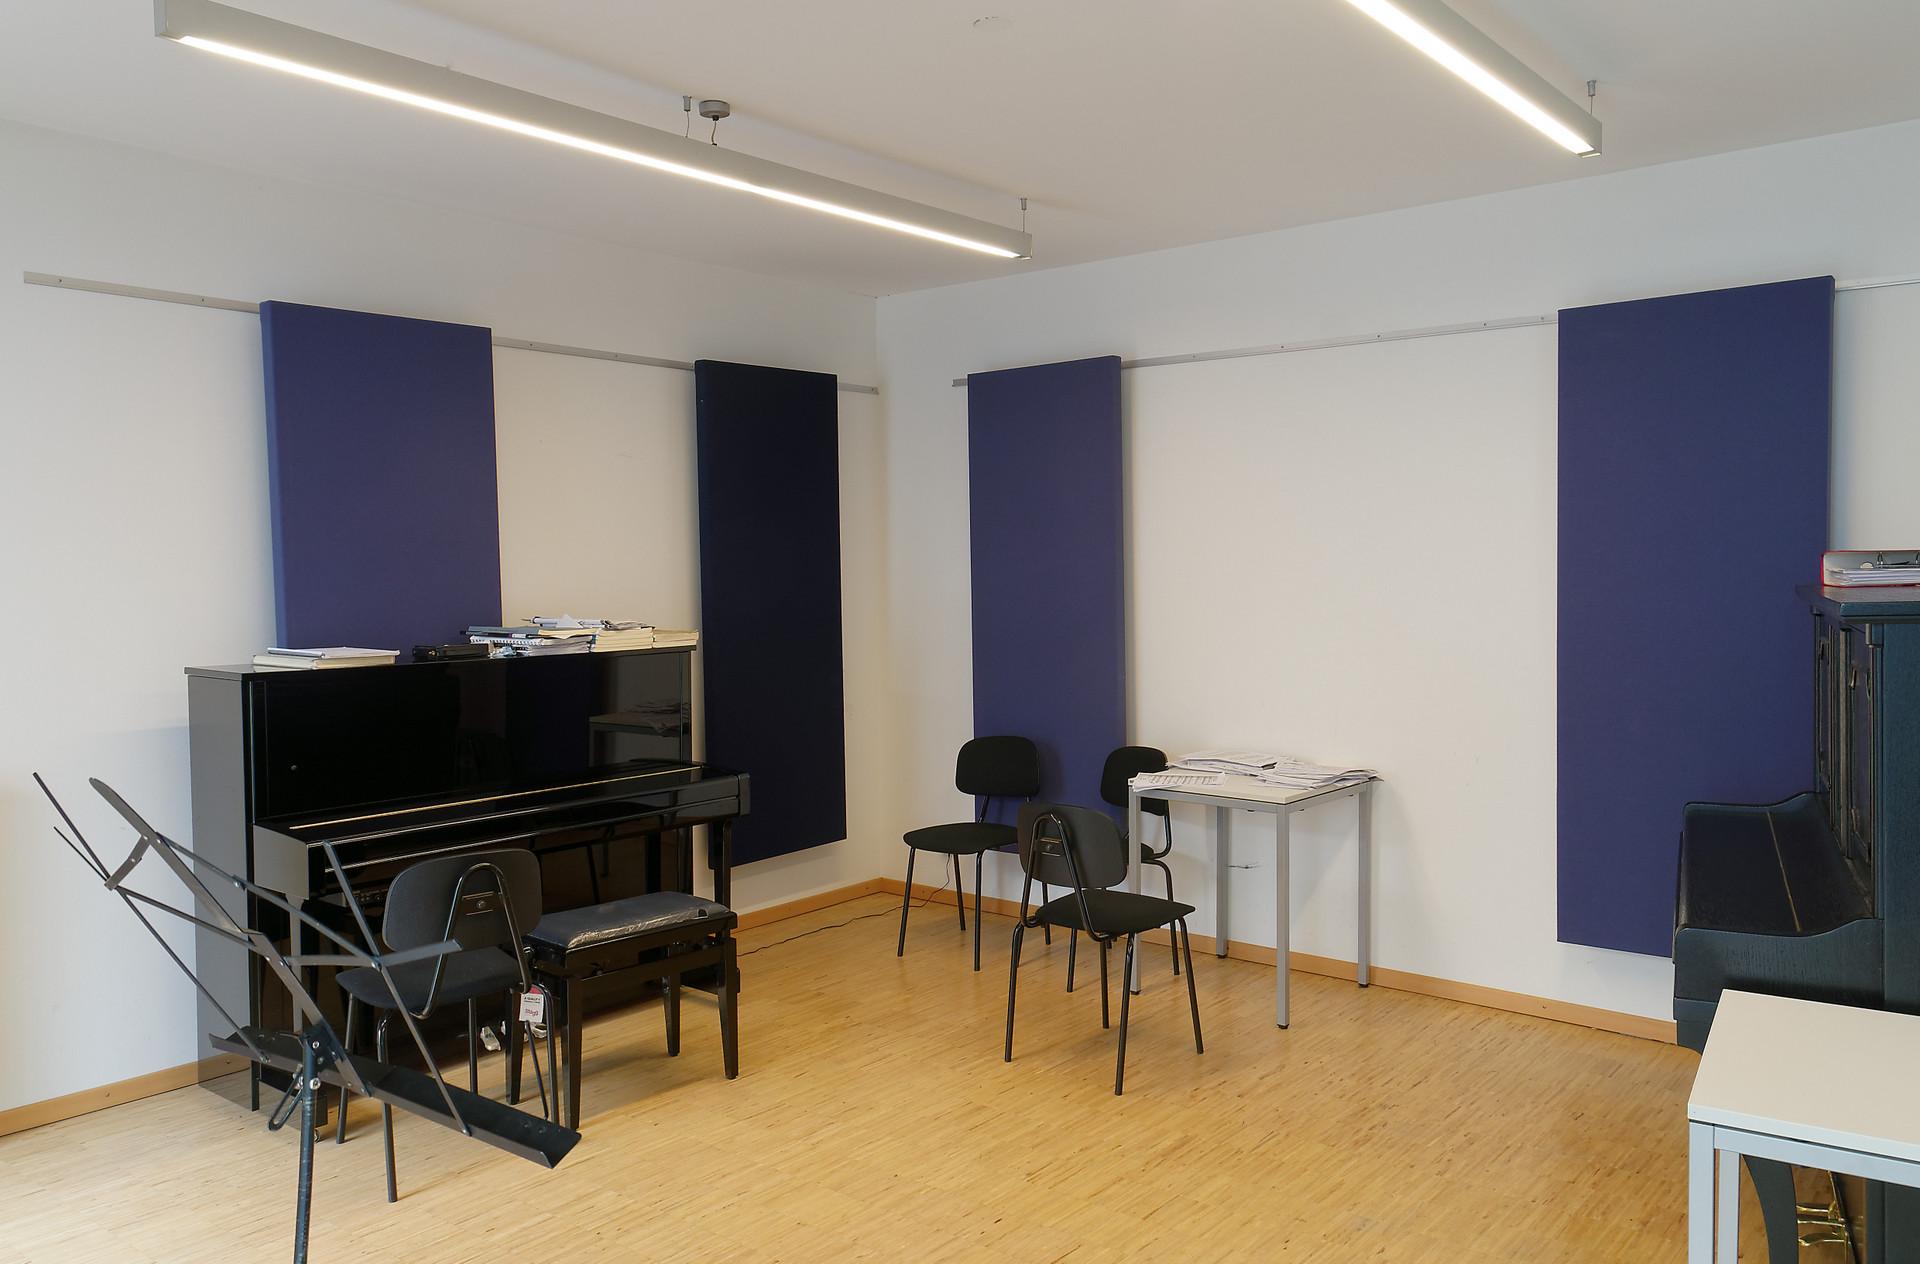 3 Zimmer Küche Bad Musik | Musikstudentenhaus Neustiftgasse 141 Studentenheimplatz At